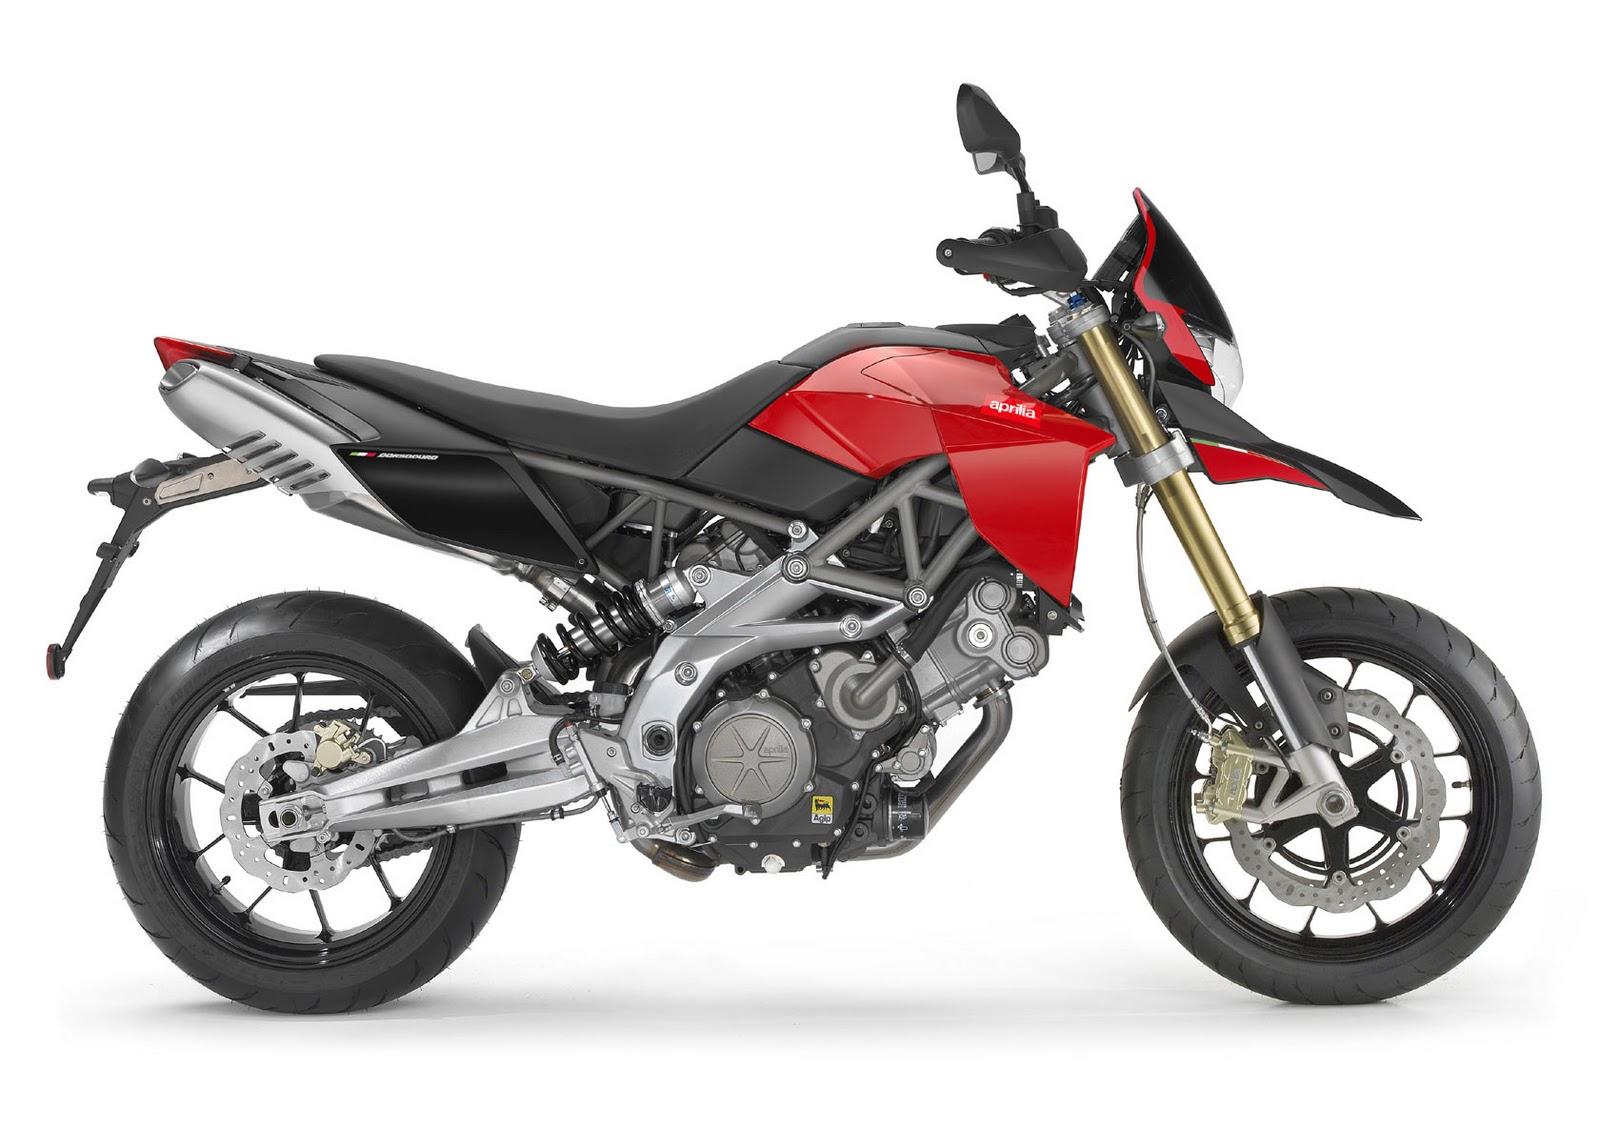 aprilia dorsoduro 750 motorcycle new style. Black Bedroom Furniture Sets. Home Design Ideas